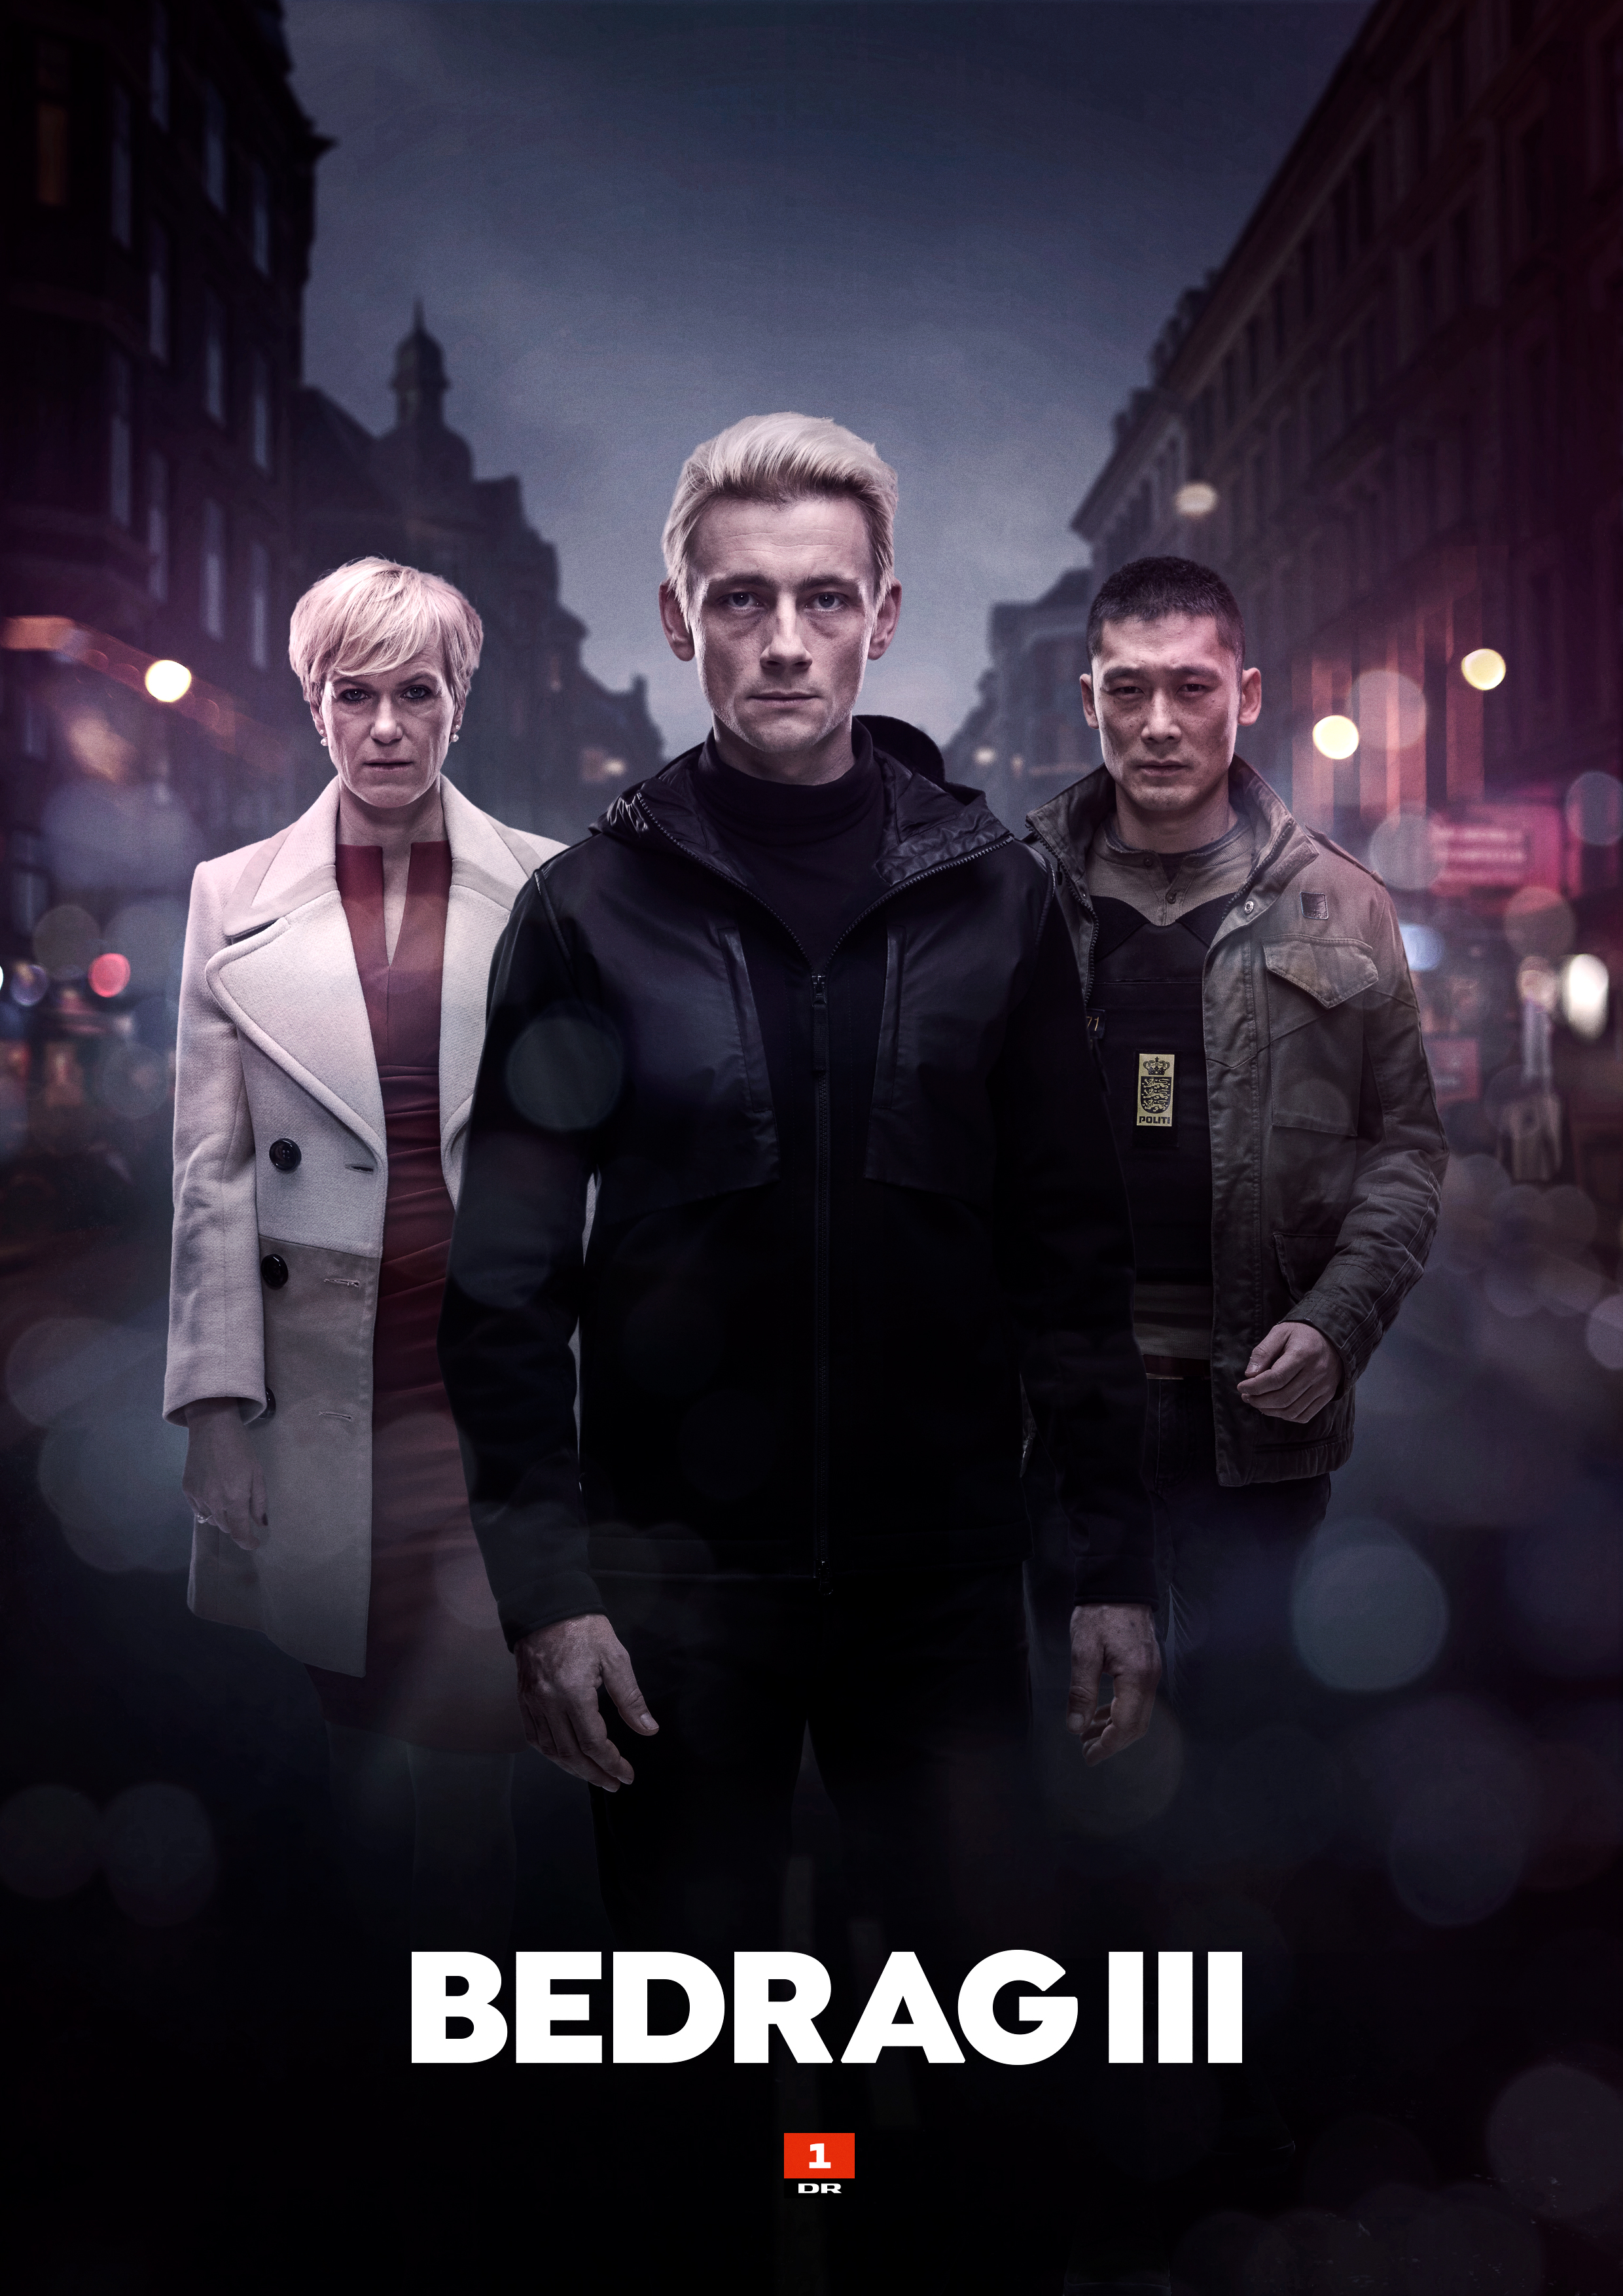 Bedrag (TV Series 2016– ) - IMDb